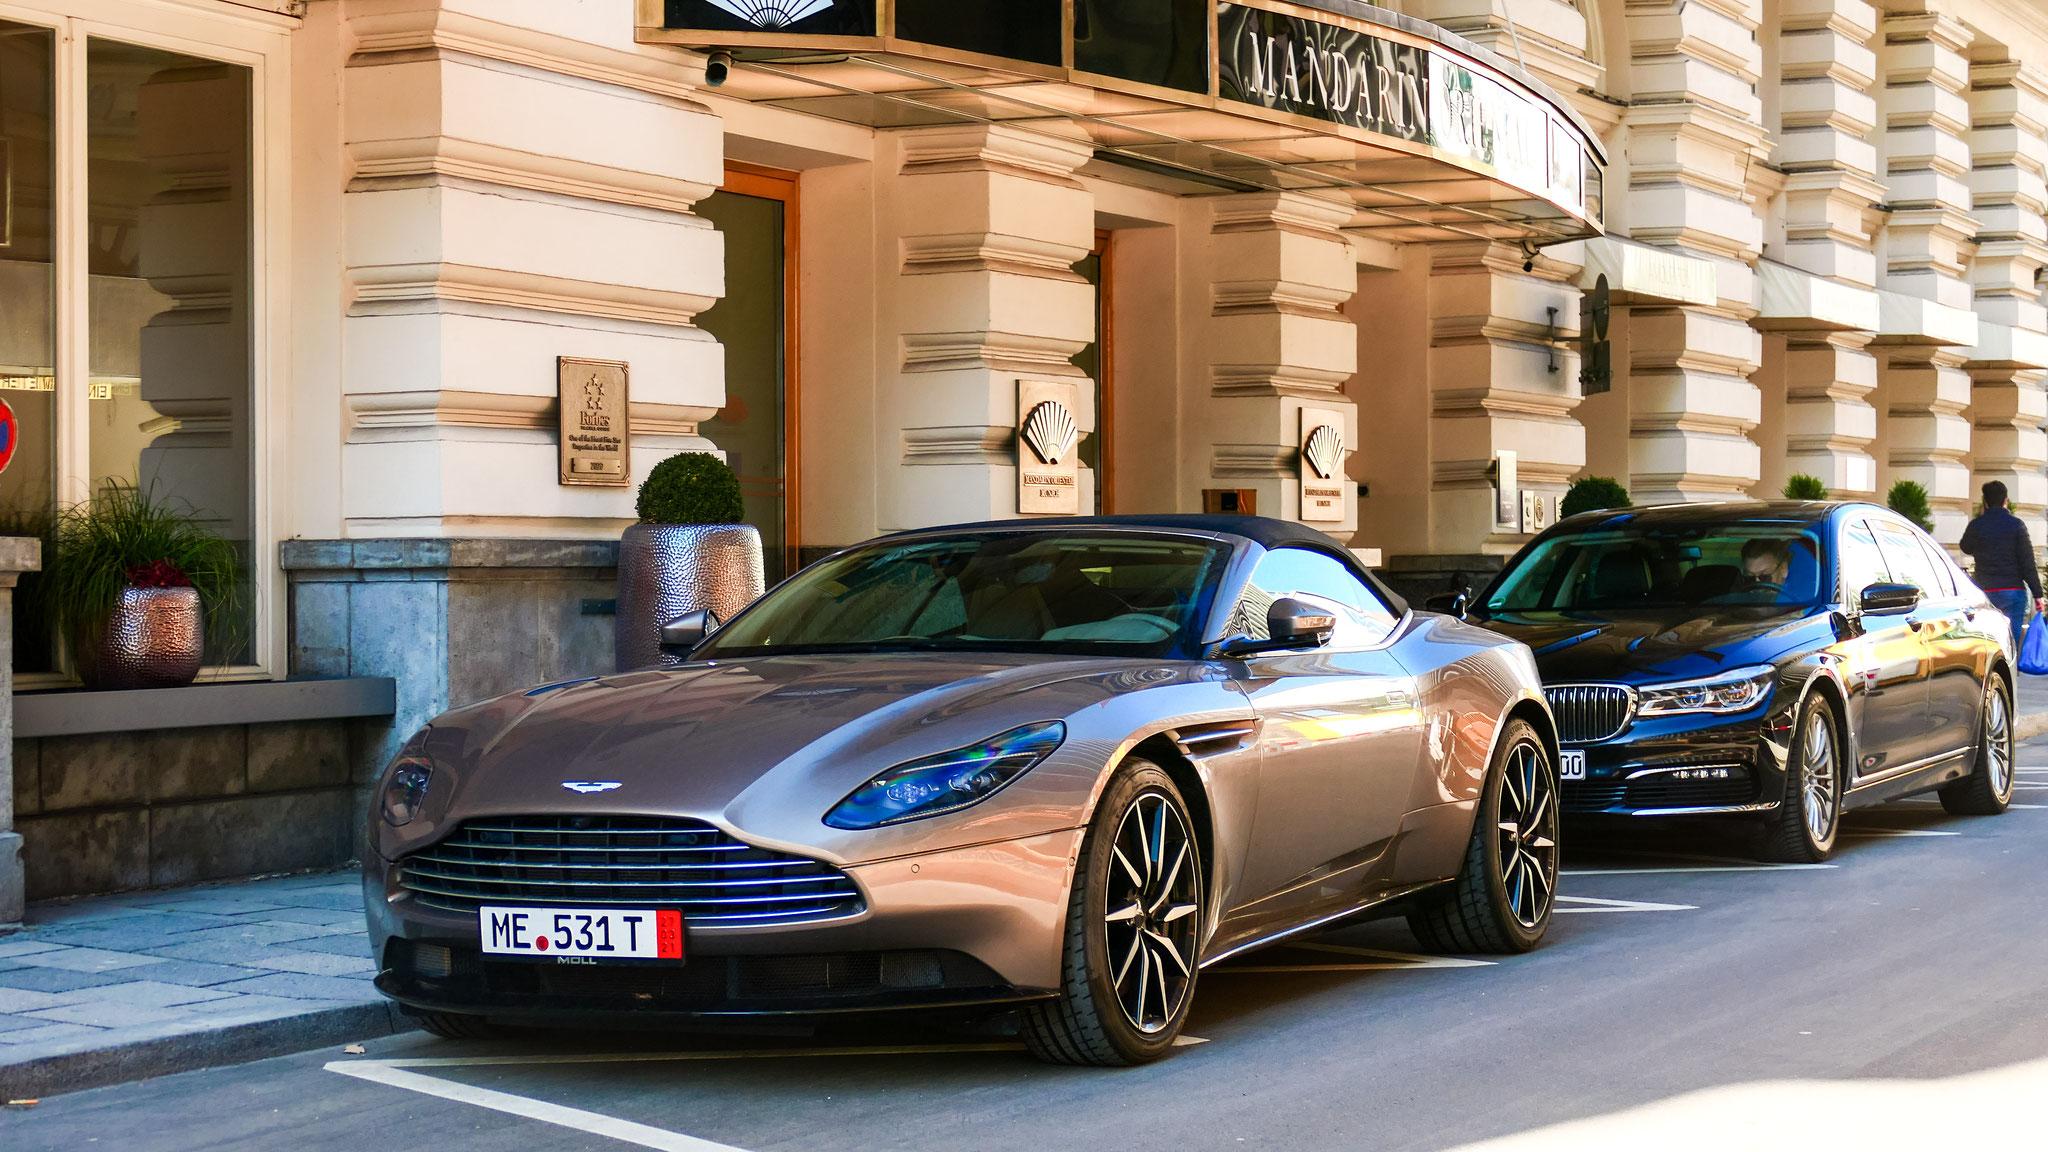 Aston Martin DB11 Volante - ME-531-T